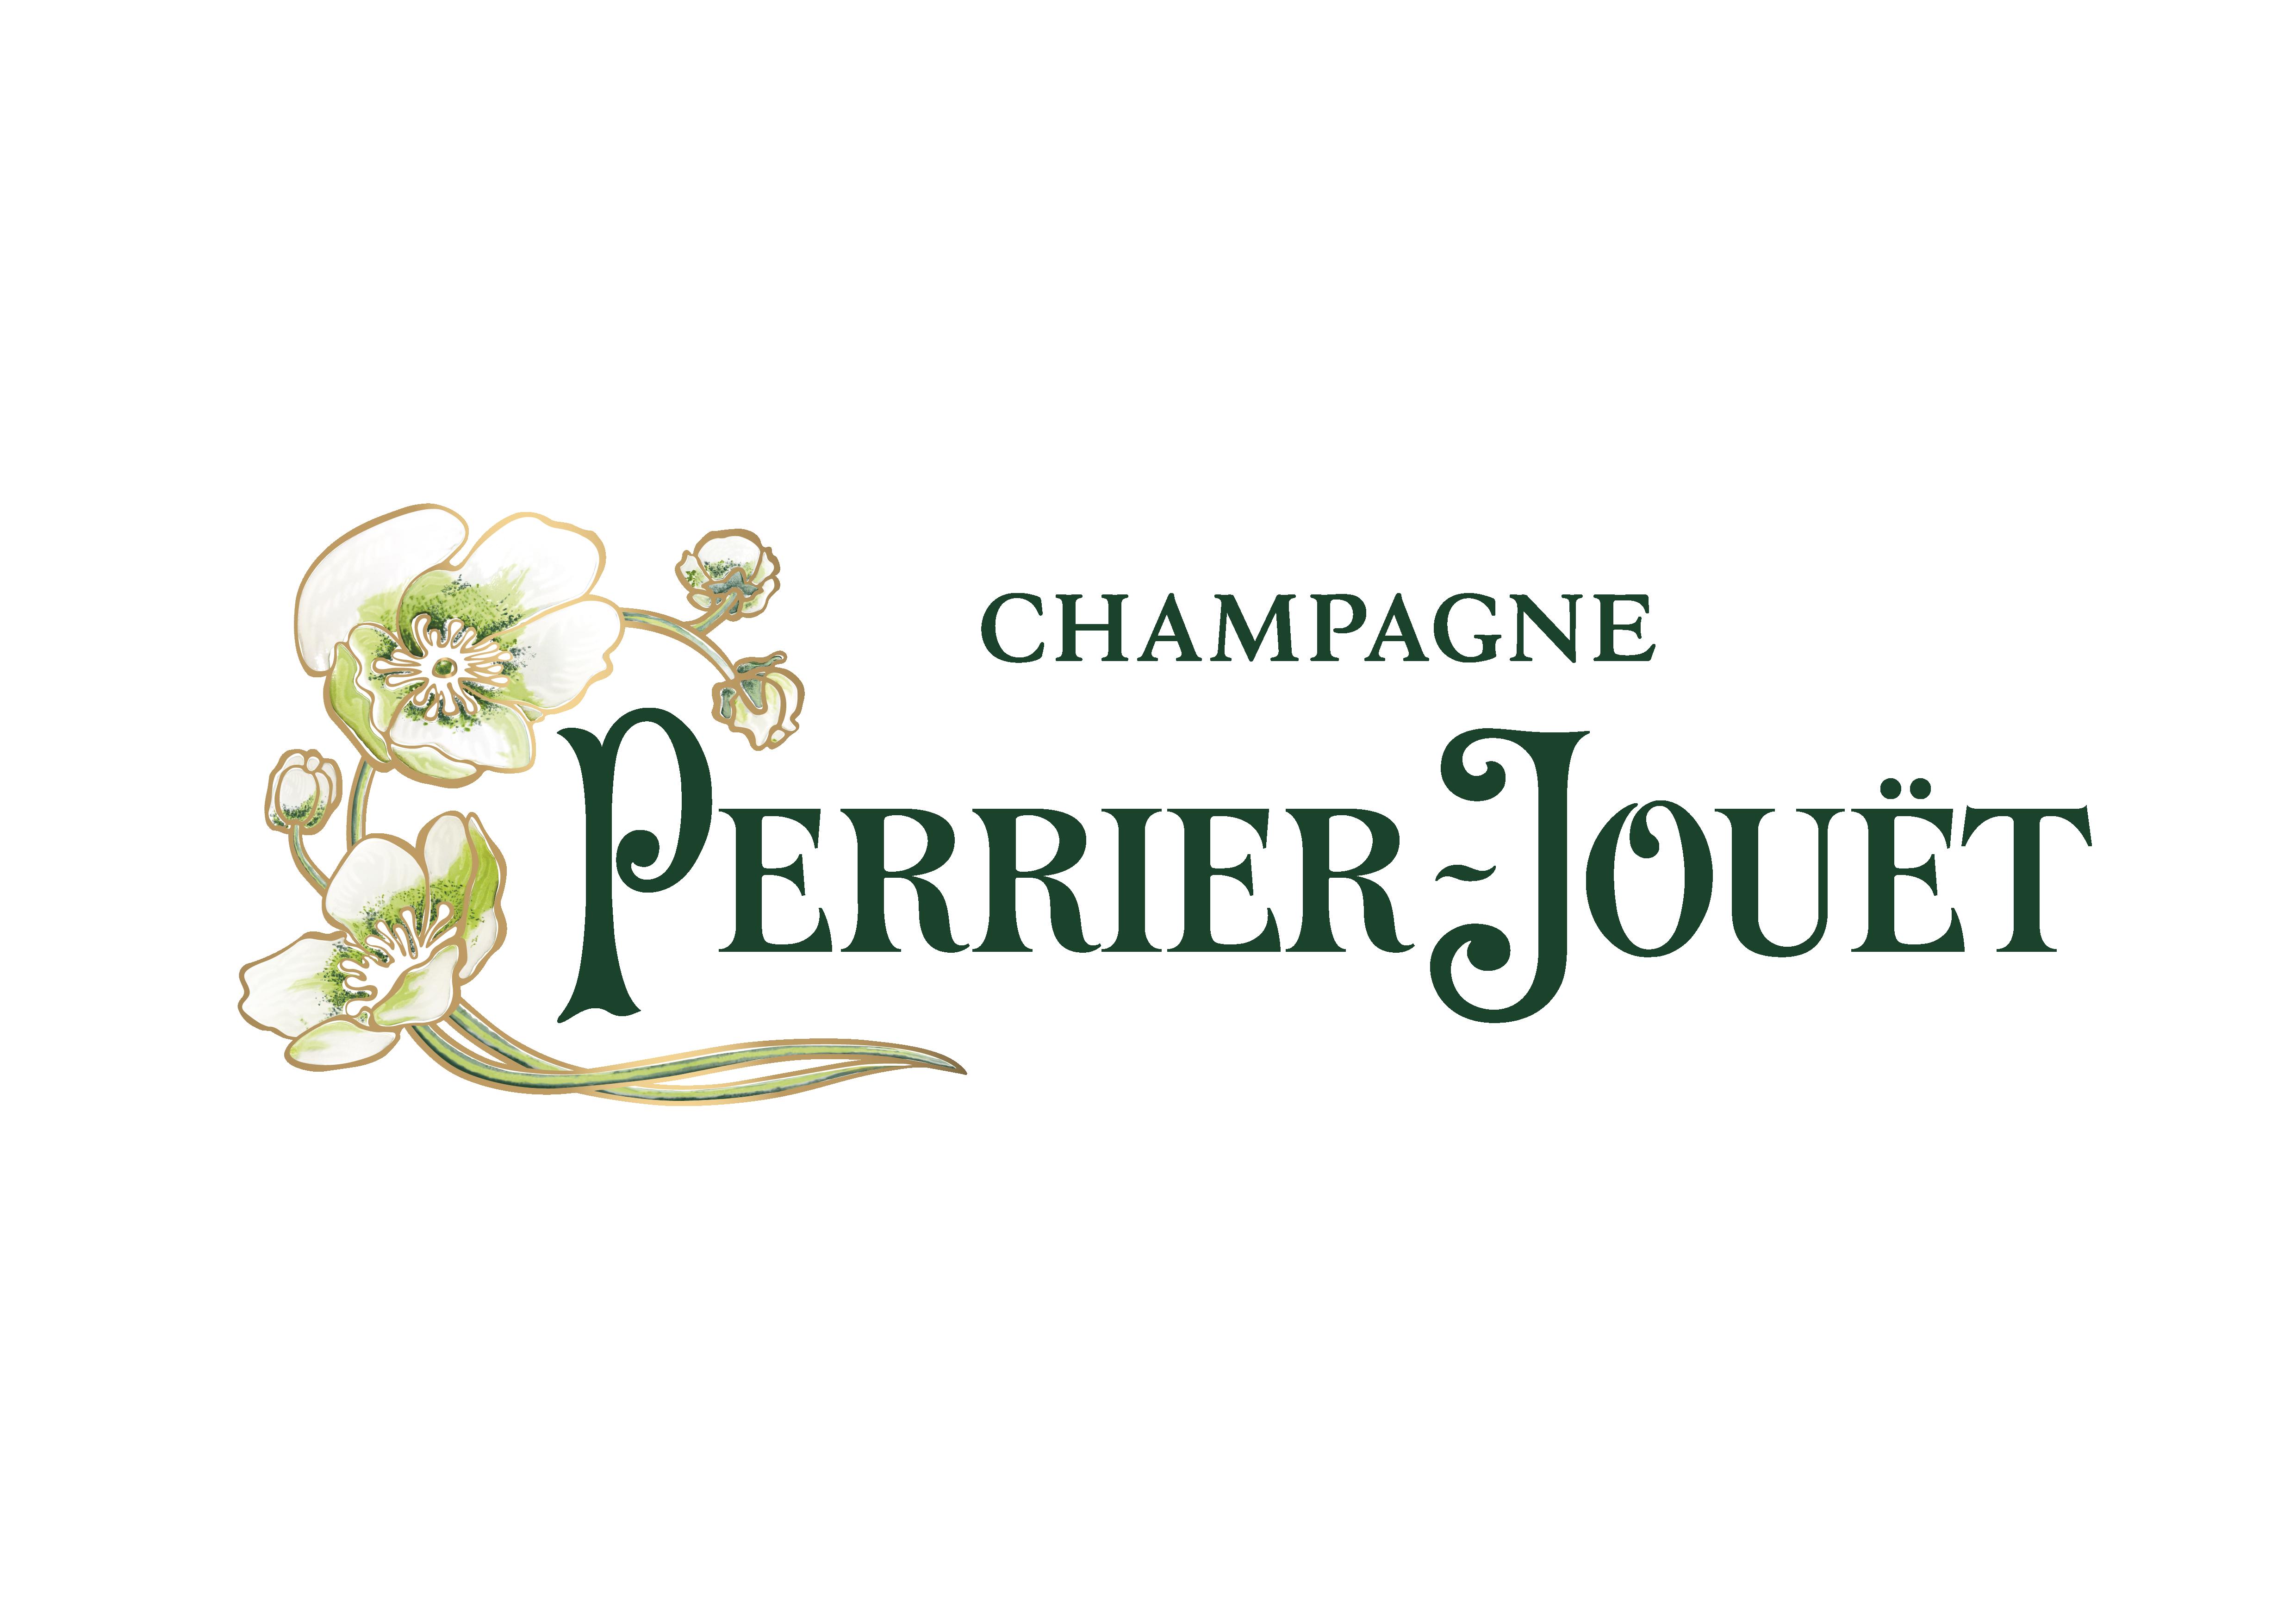 Perriet Julet Champagner